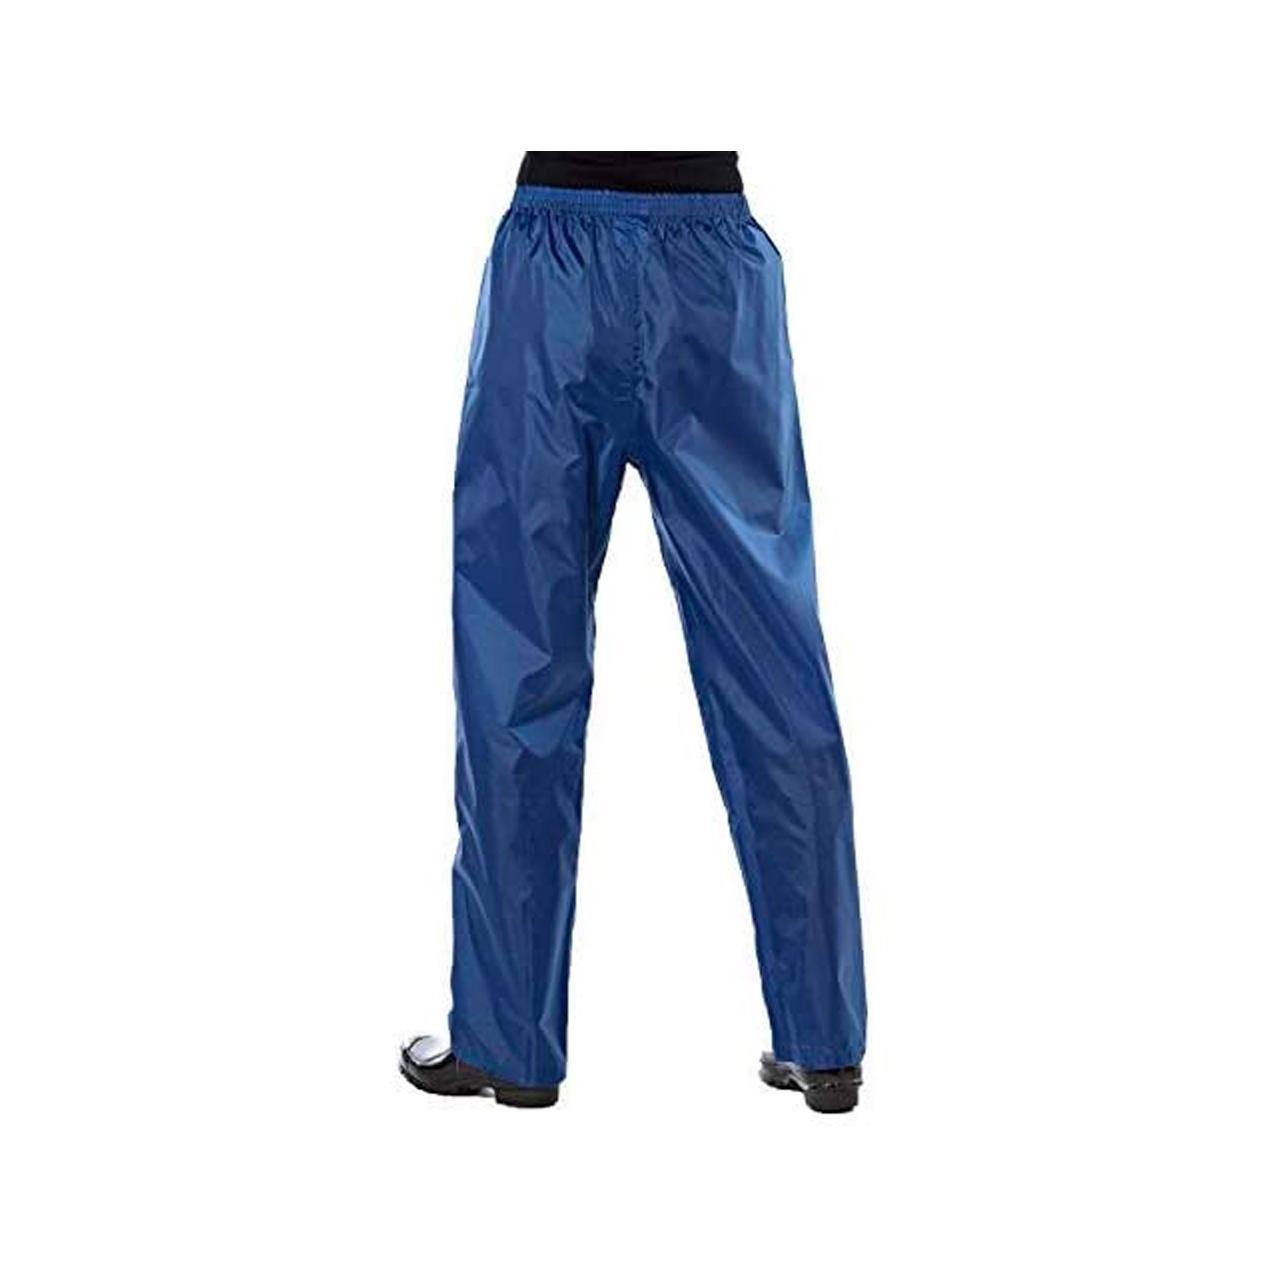 Pro Climate Women's Waterproof Trousers (Blue, Large)